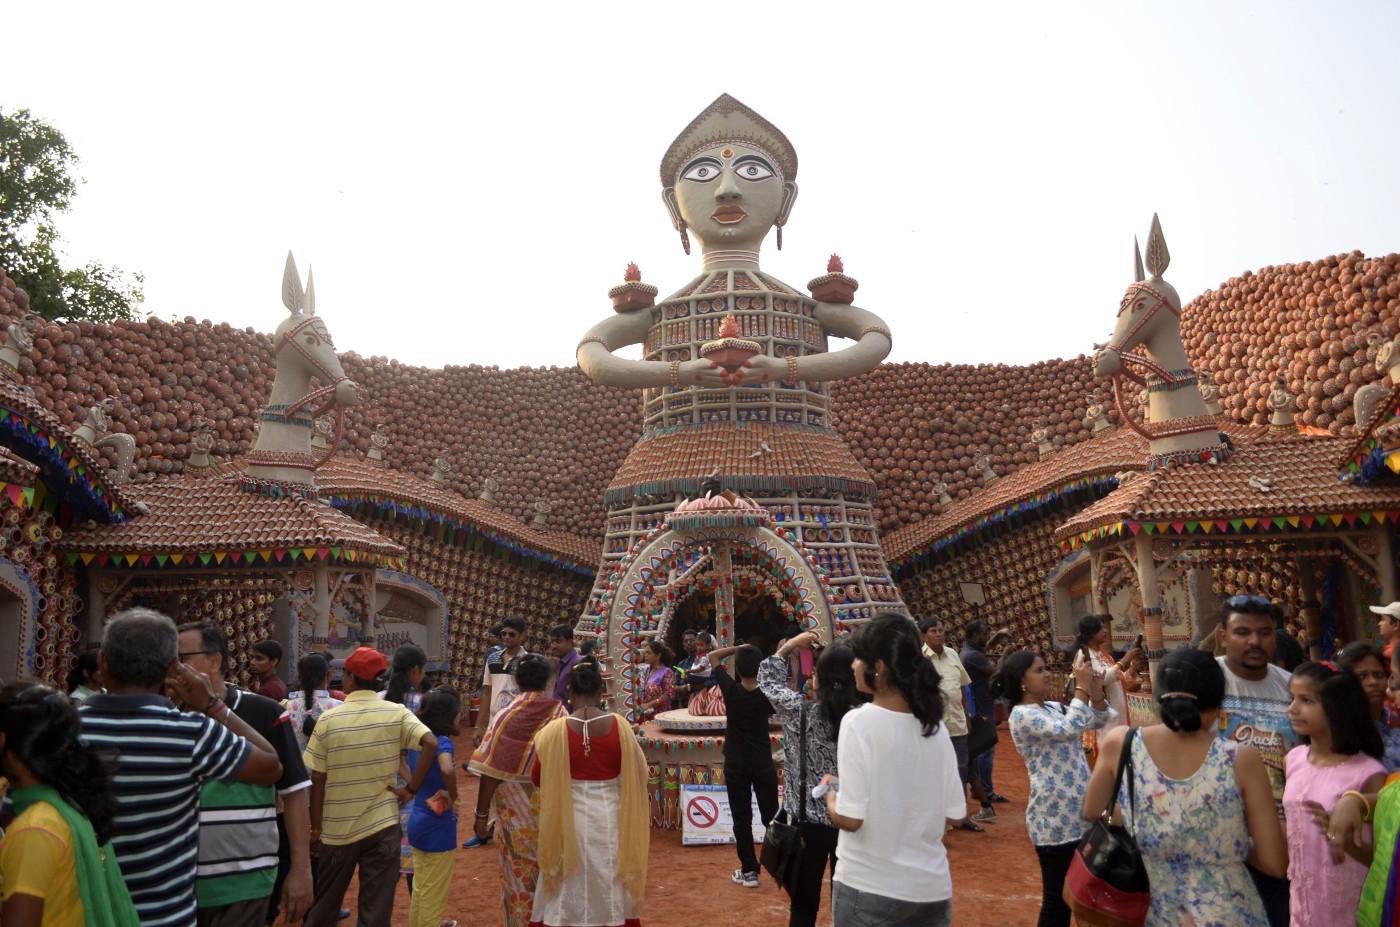 Rising figure above the entrance, Kolkata Durga Puja 2015